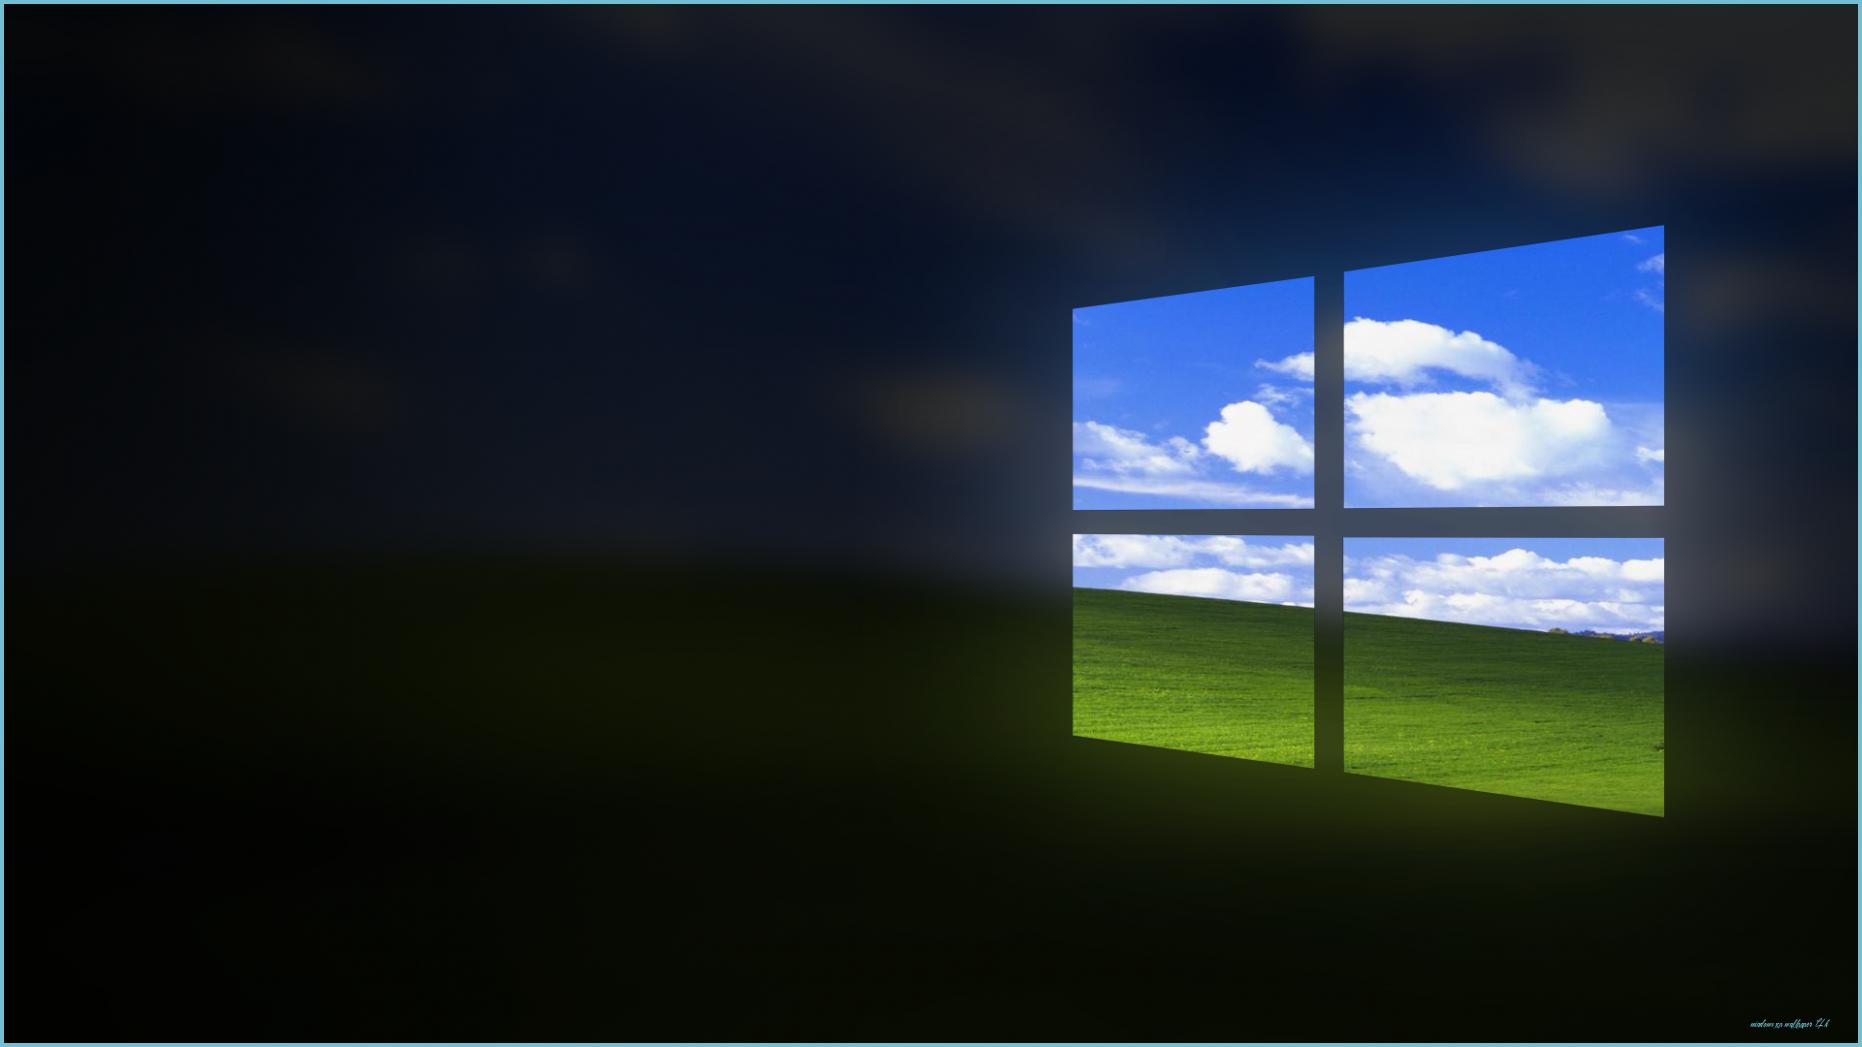 114 Quick Tips For Windows Xp Wallpaper 114k Windows Xp Wallpaper 14k In 2020 Cool Desktop Wallpapers Desktop Wallpapers Backgrounds Wallpaper Windows 10